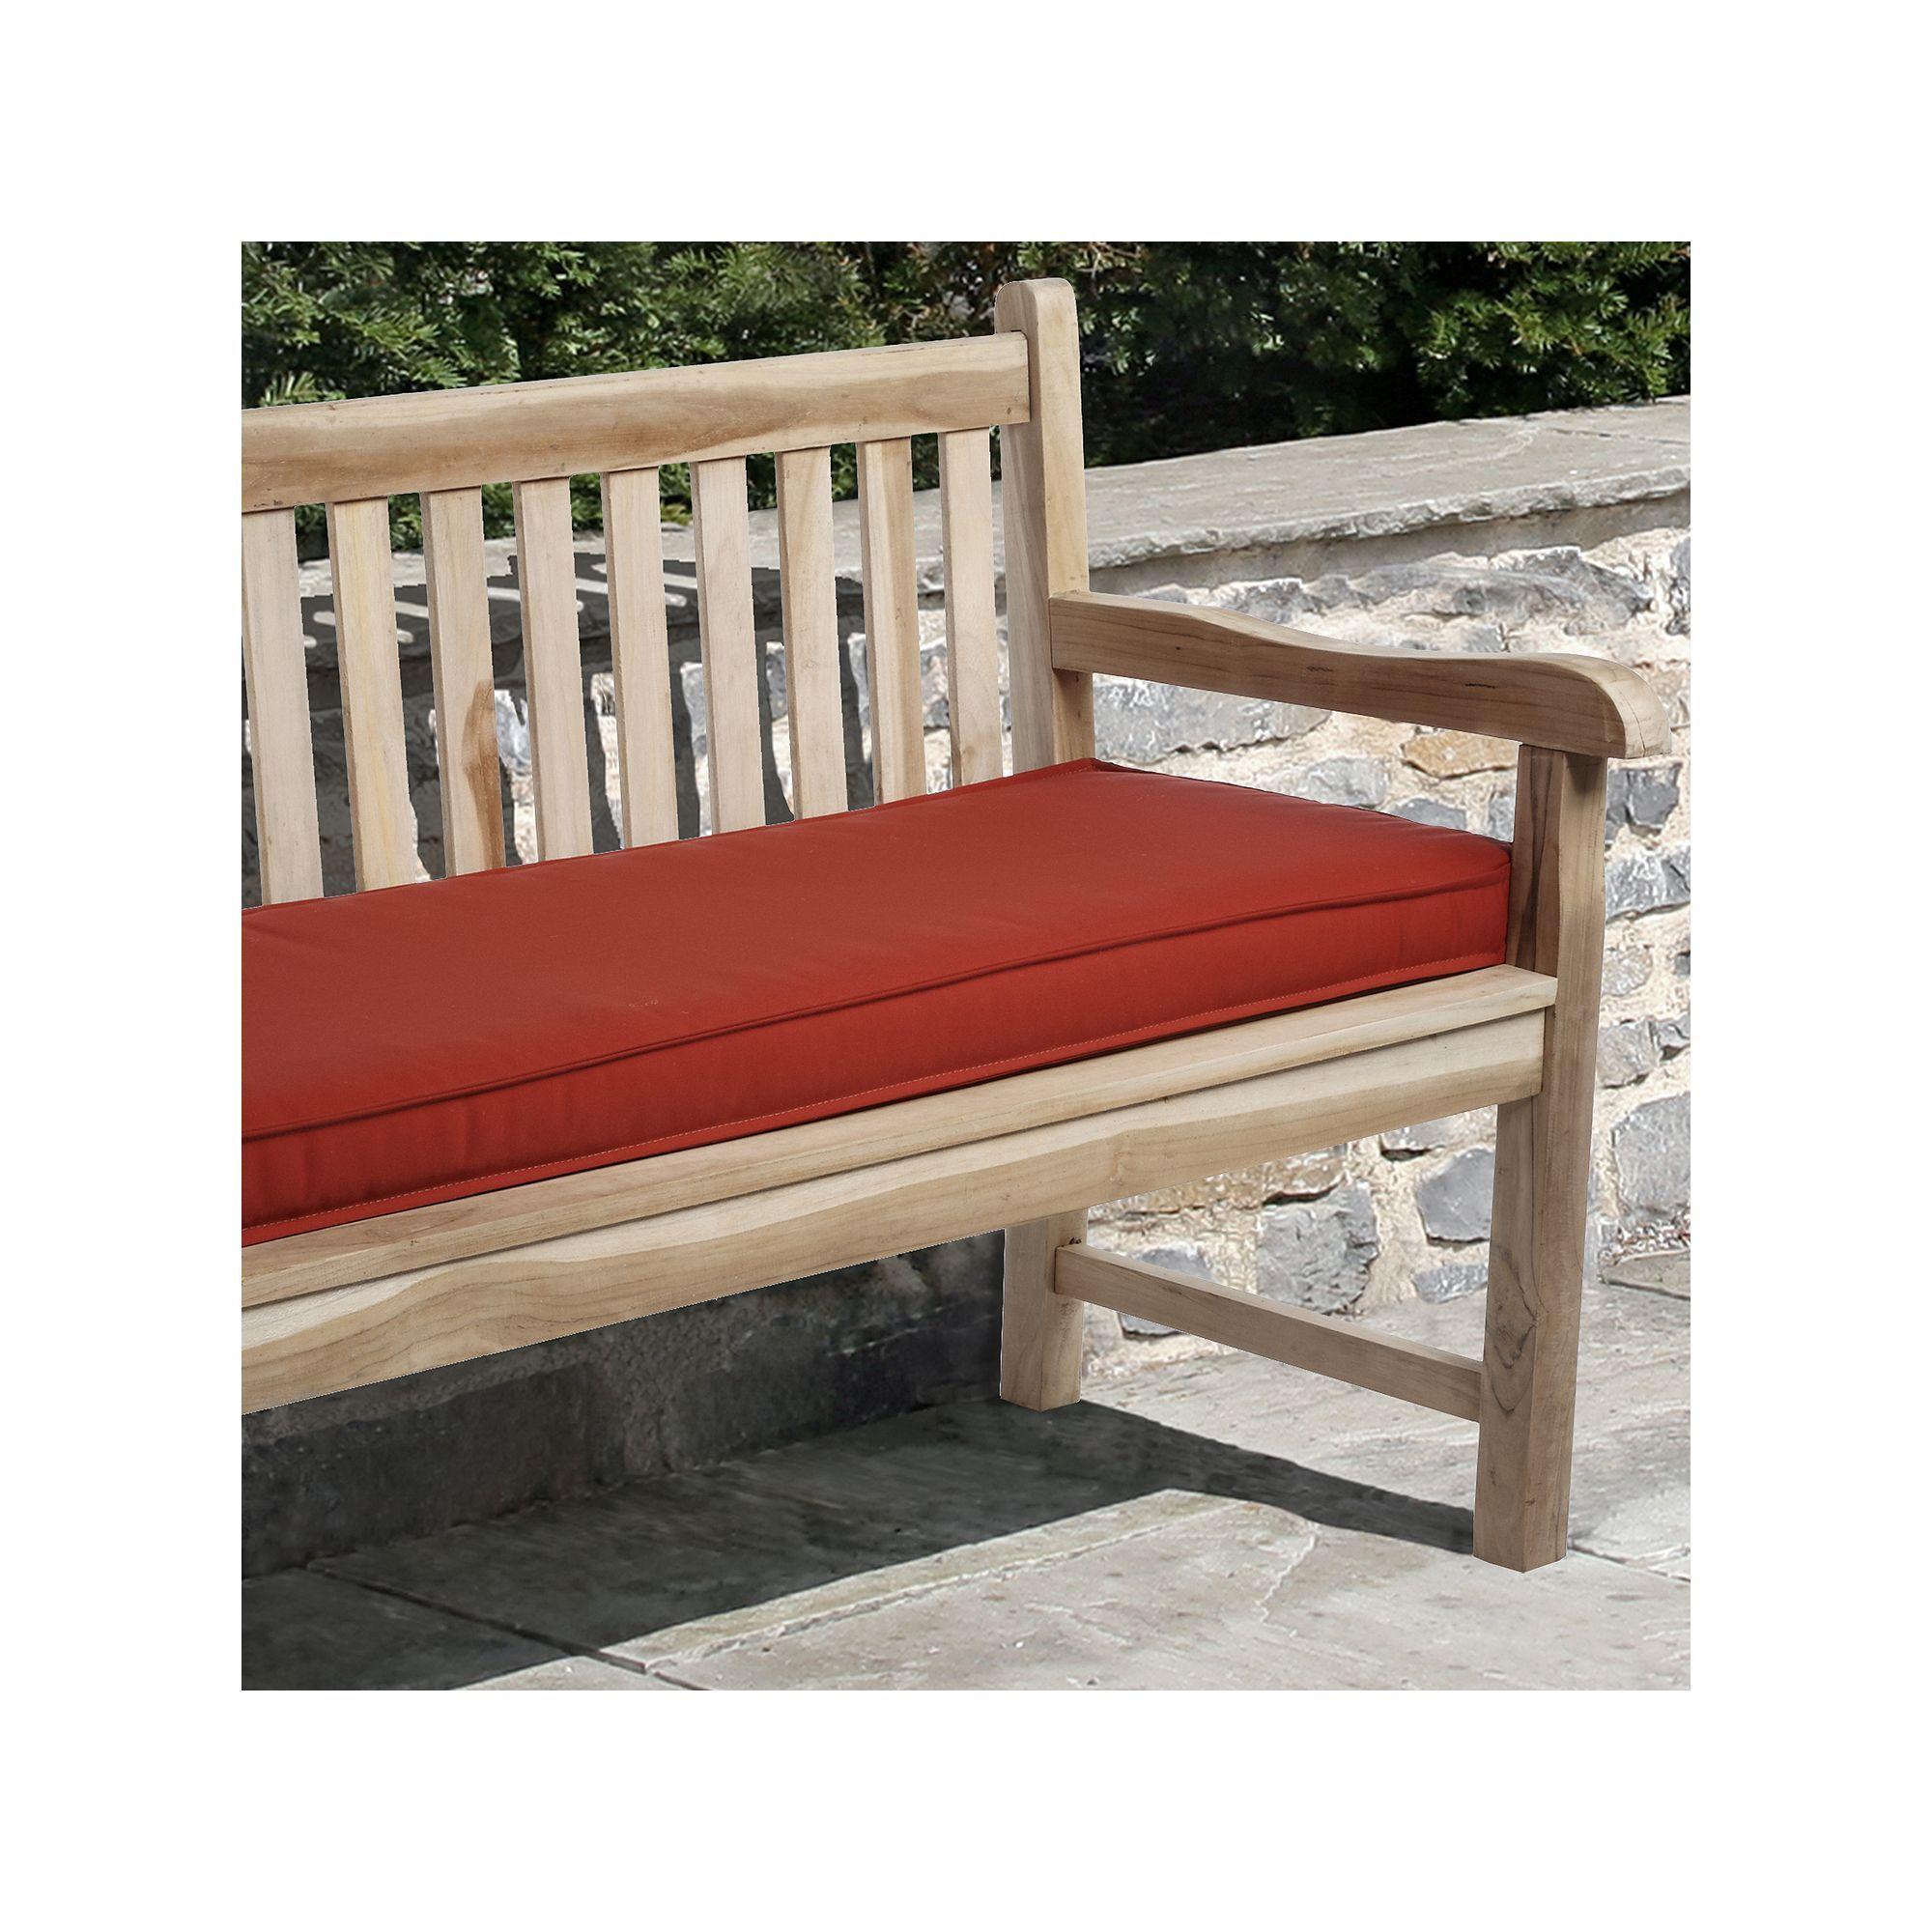 Mozaic Sunbrella 60 X 19 Canvas Outdoor Bench Cushion Bench Cushions Furniture Cushions On Sofa